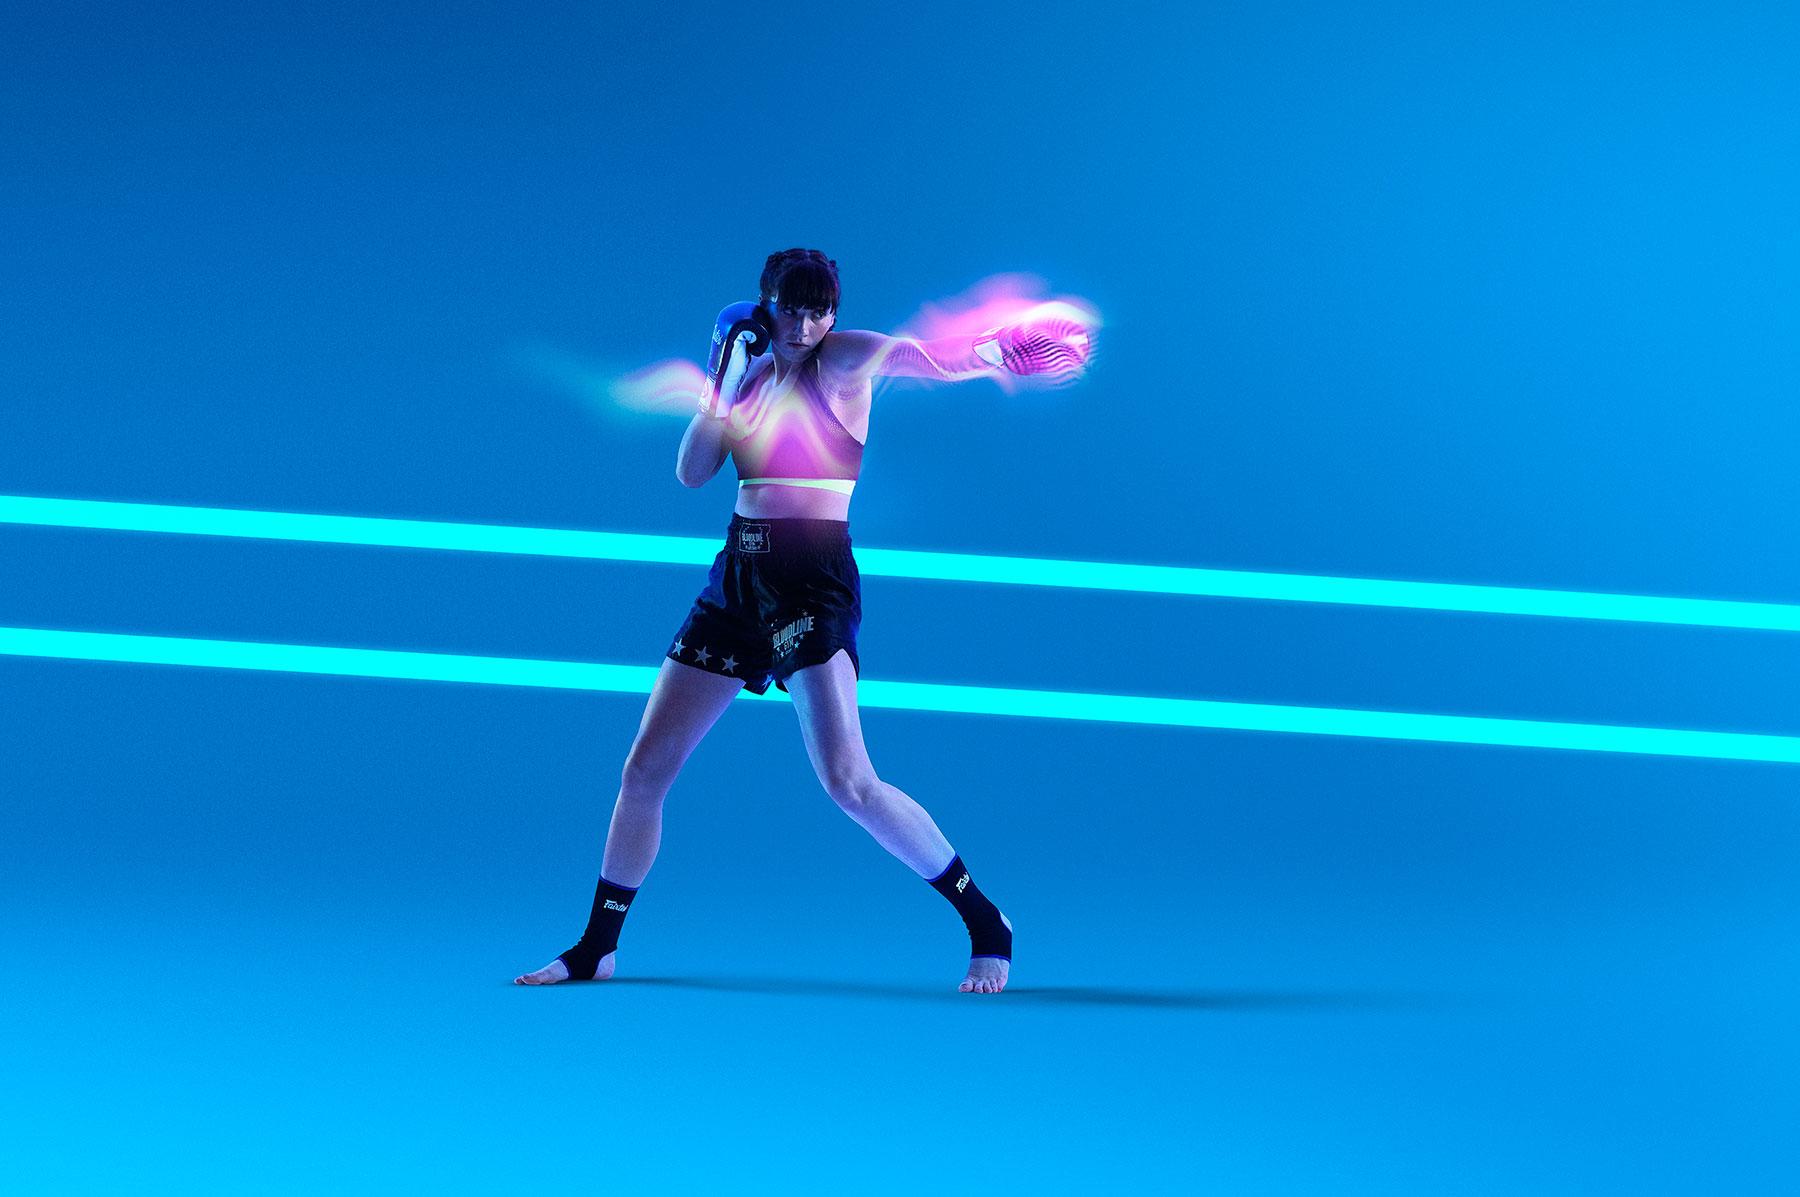 3900_boxer-sports-athlete-retouching.jpg